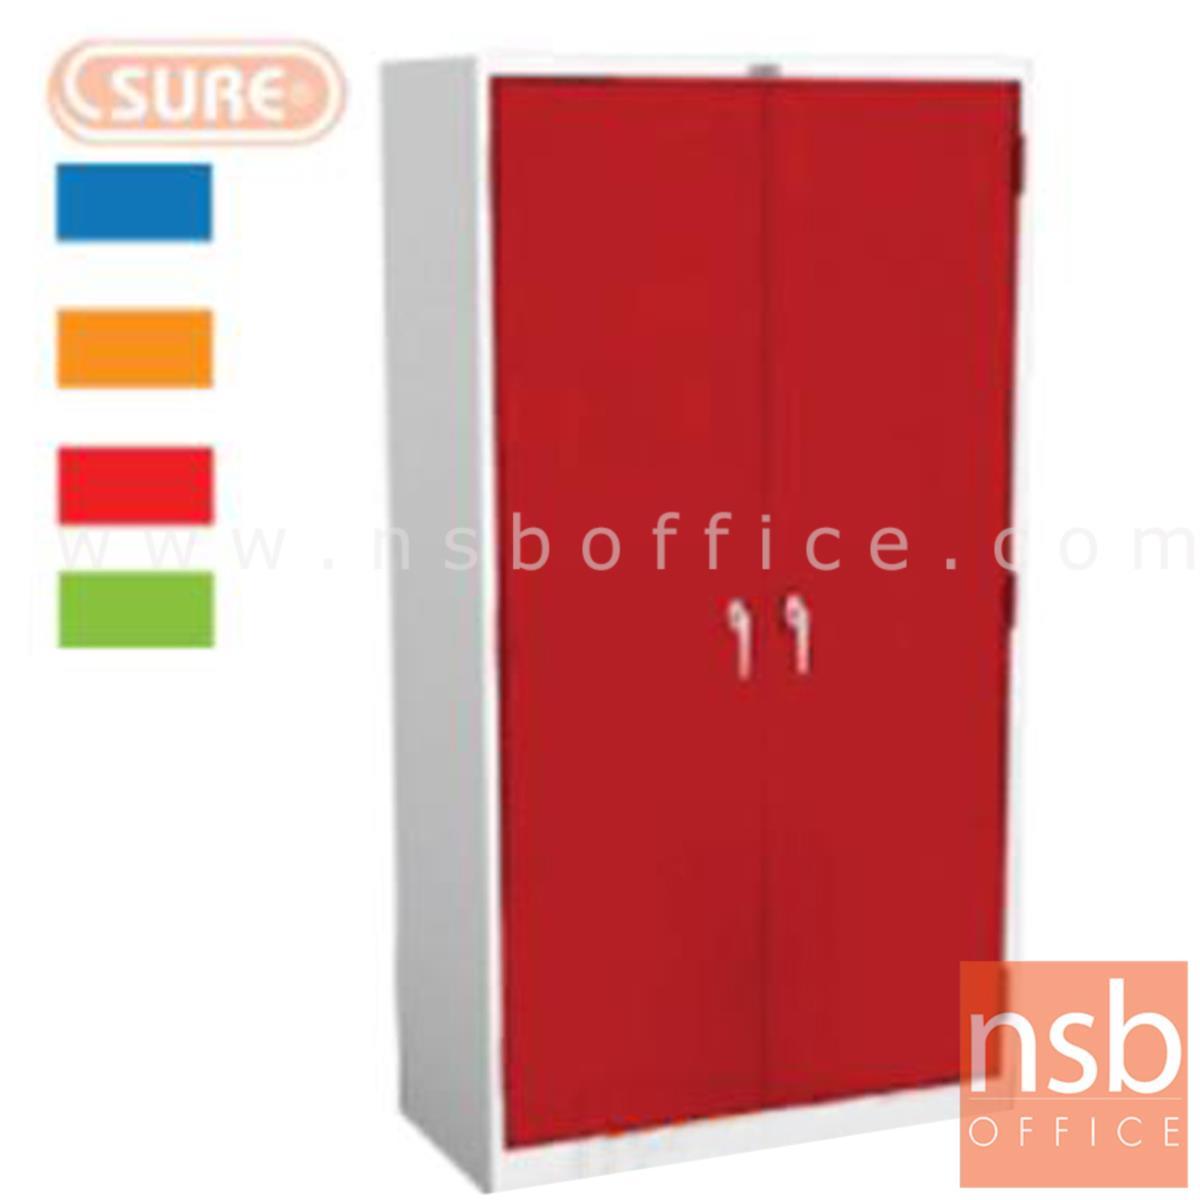 E04A042:ตู้เหล็ก 2 บานเปิดทึบสูง 182.9H cm. รุ่น SURE-CLK-1 หน้าบานสีสัน (มือจับบิด)